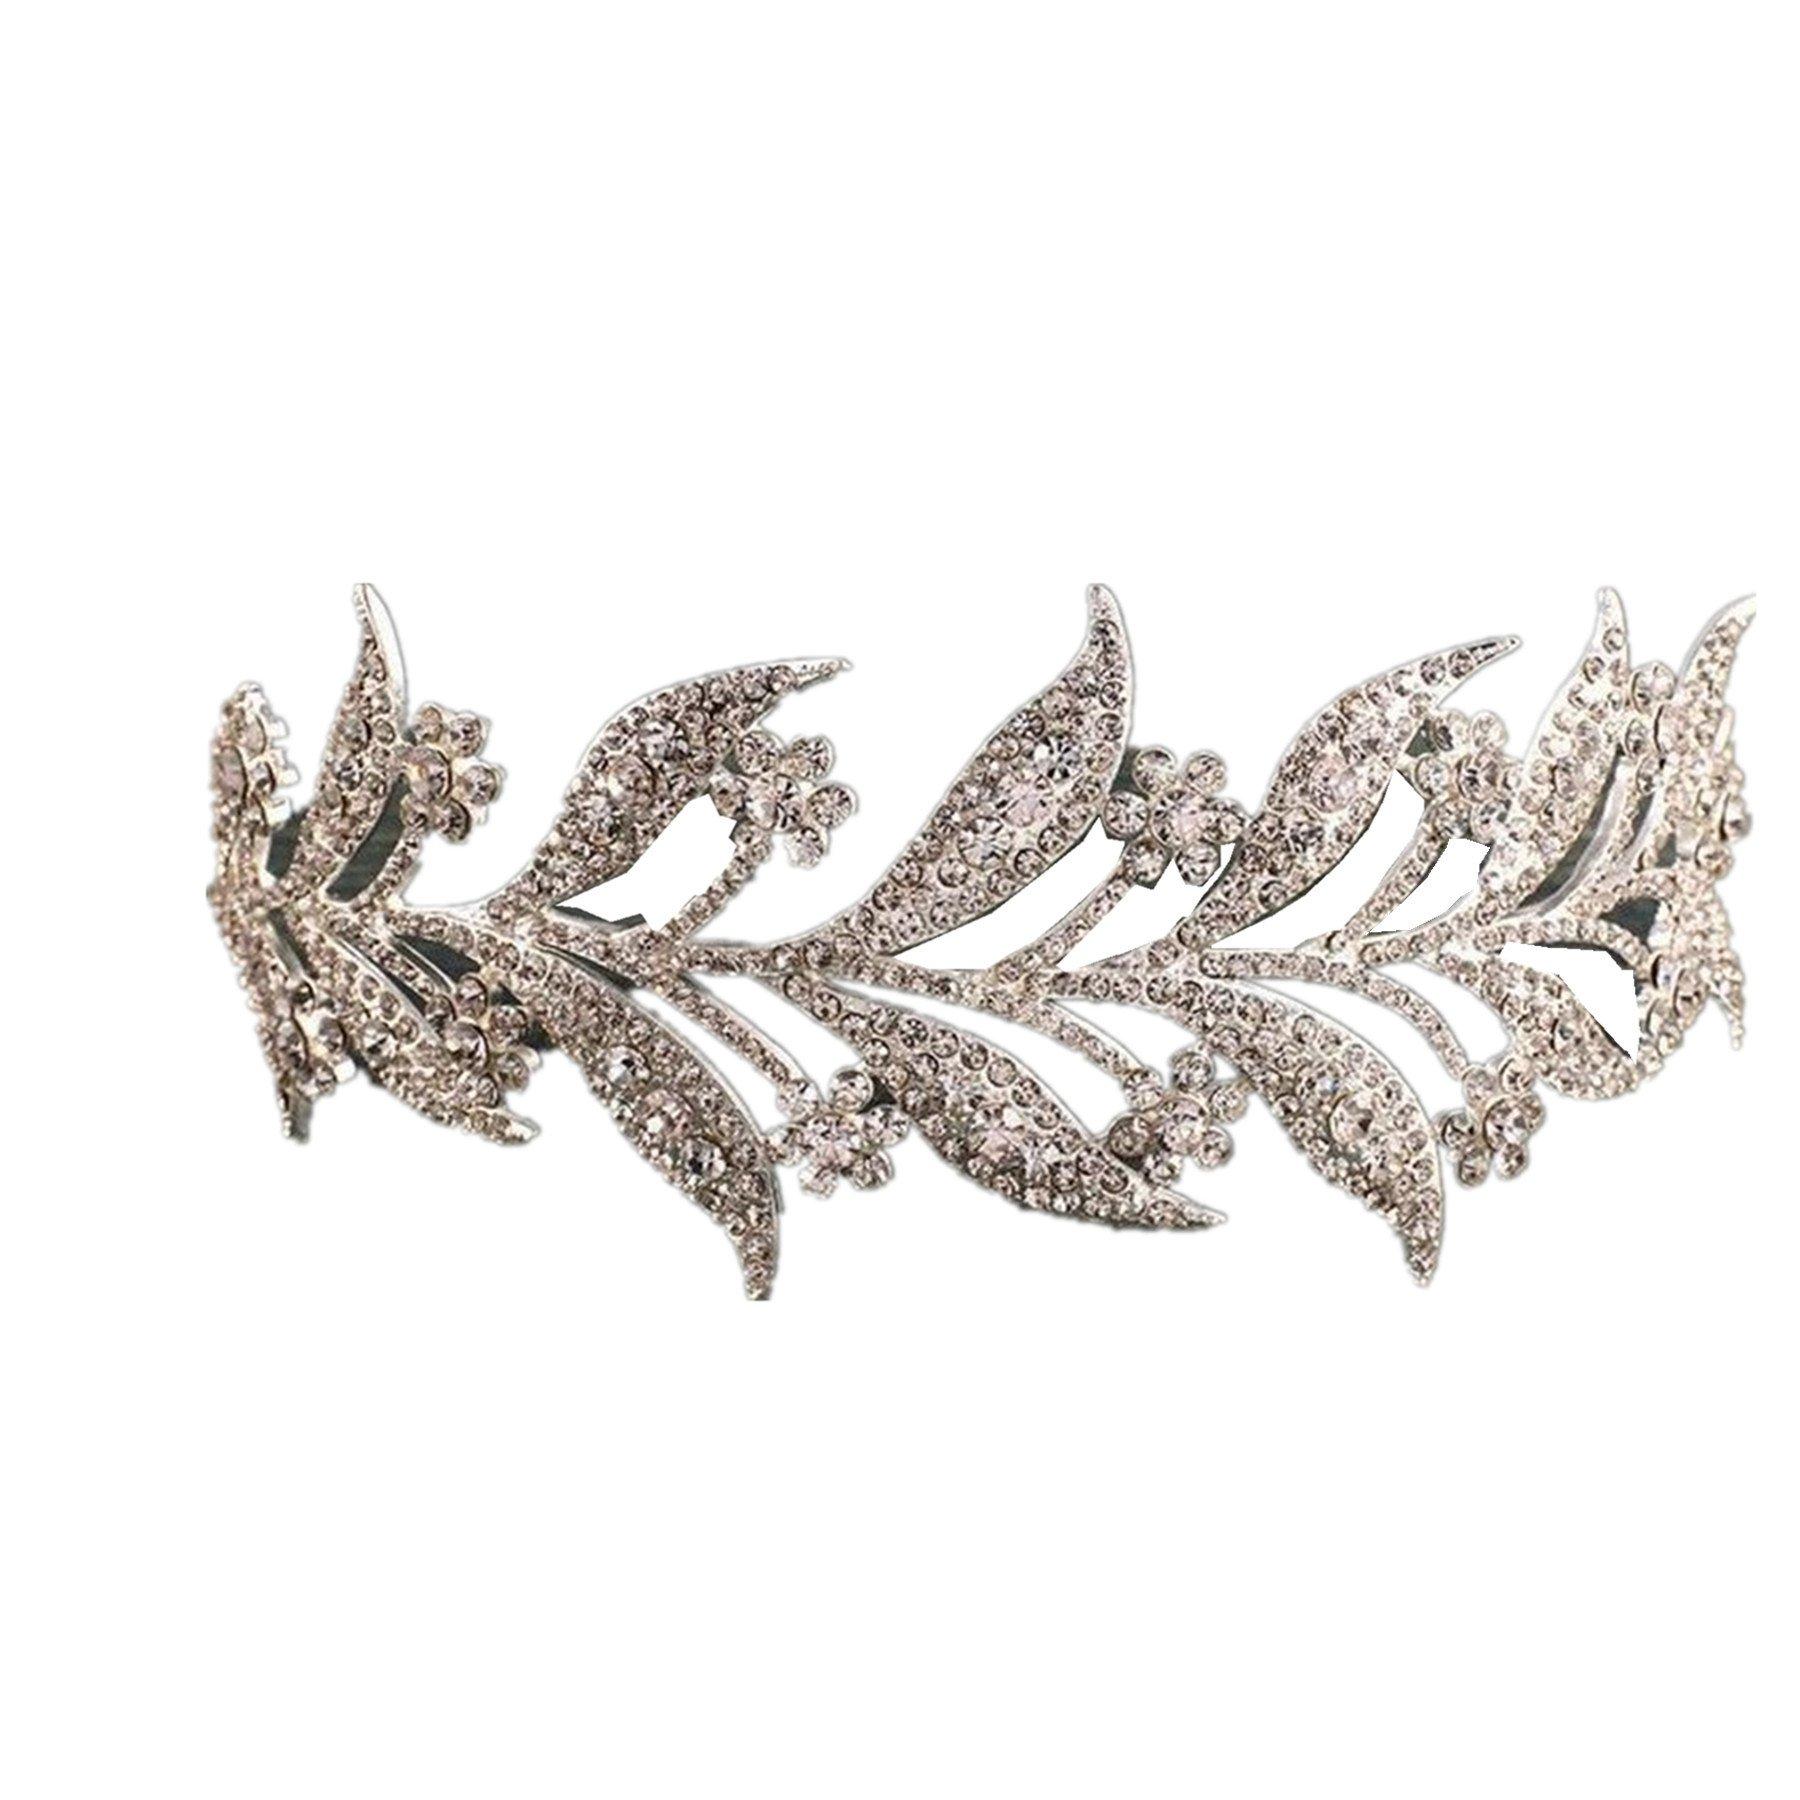 Wiipu Leaves Rhinestone Crystal Wedding Headband Bridal Tiara Crown(N434) (silver-tone)